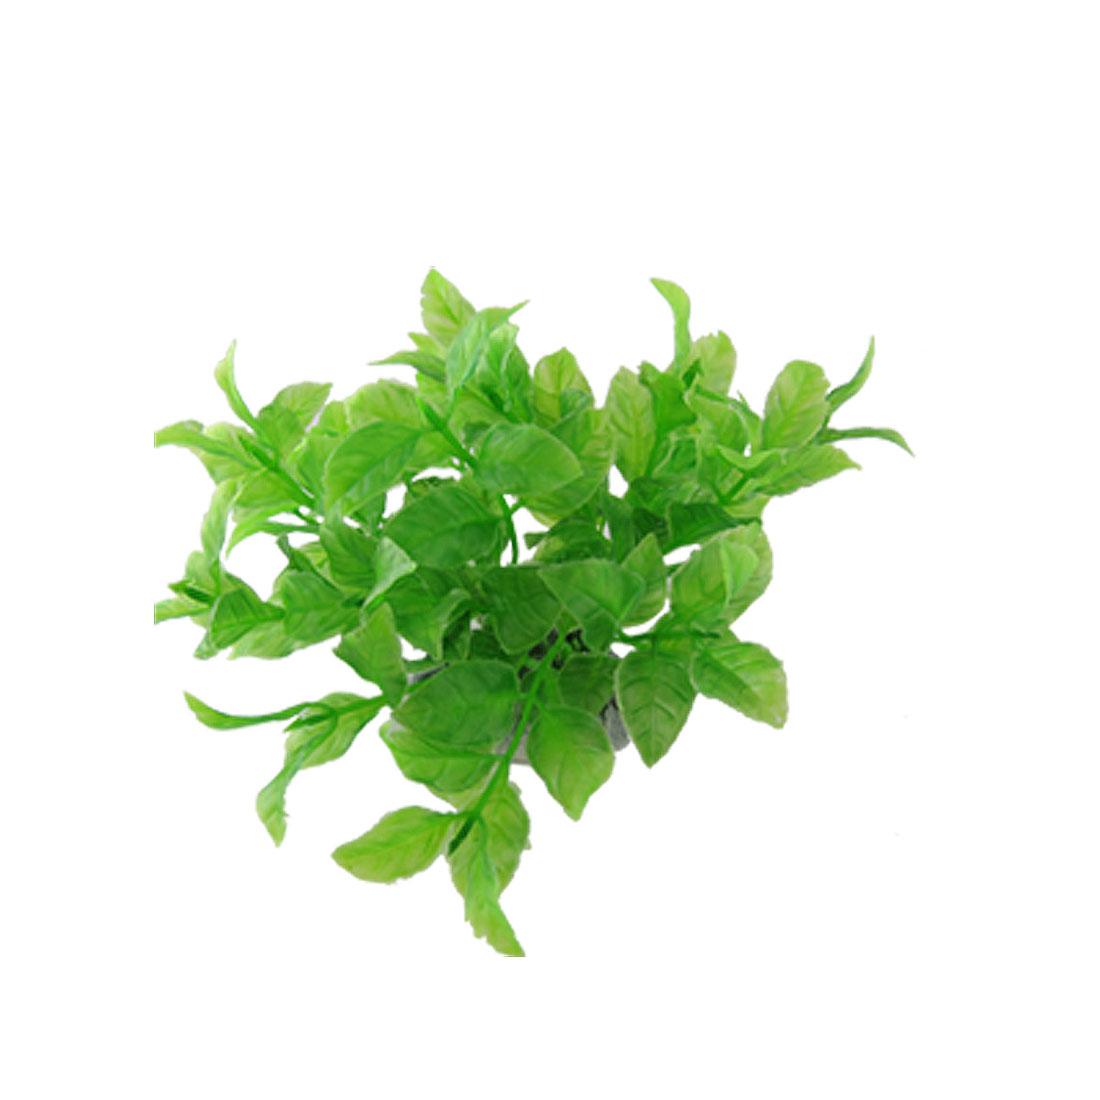 Green Plastic Aqurium Plants Fish Tank Ornament w. Base